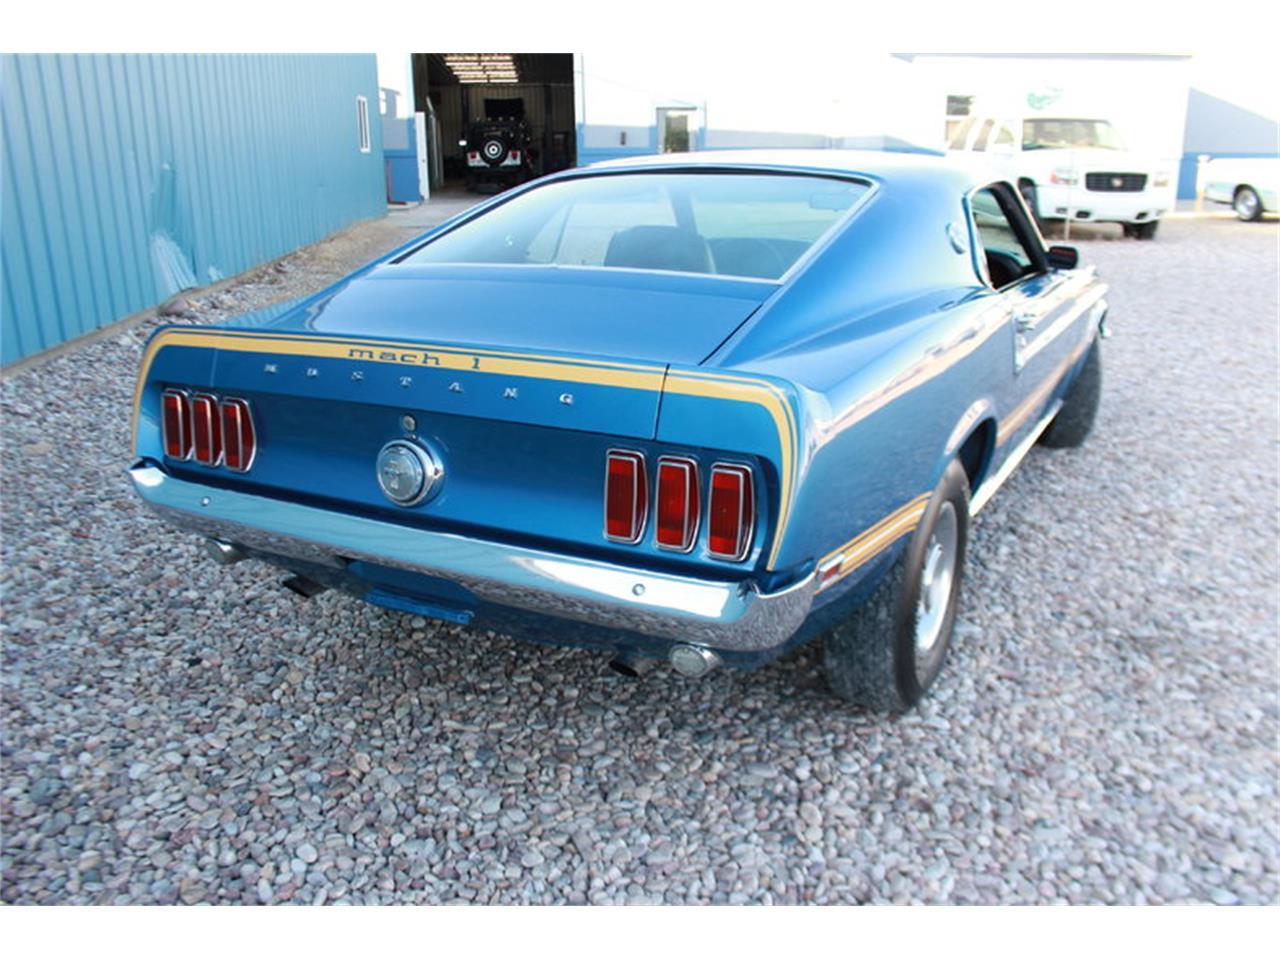 Large Picture of '69 Mustang located in Vernal Utah - $34,900.00 - LDCX